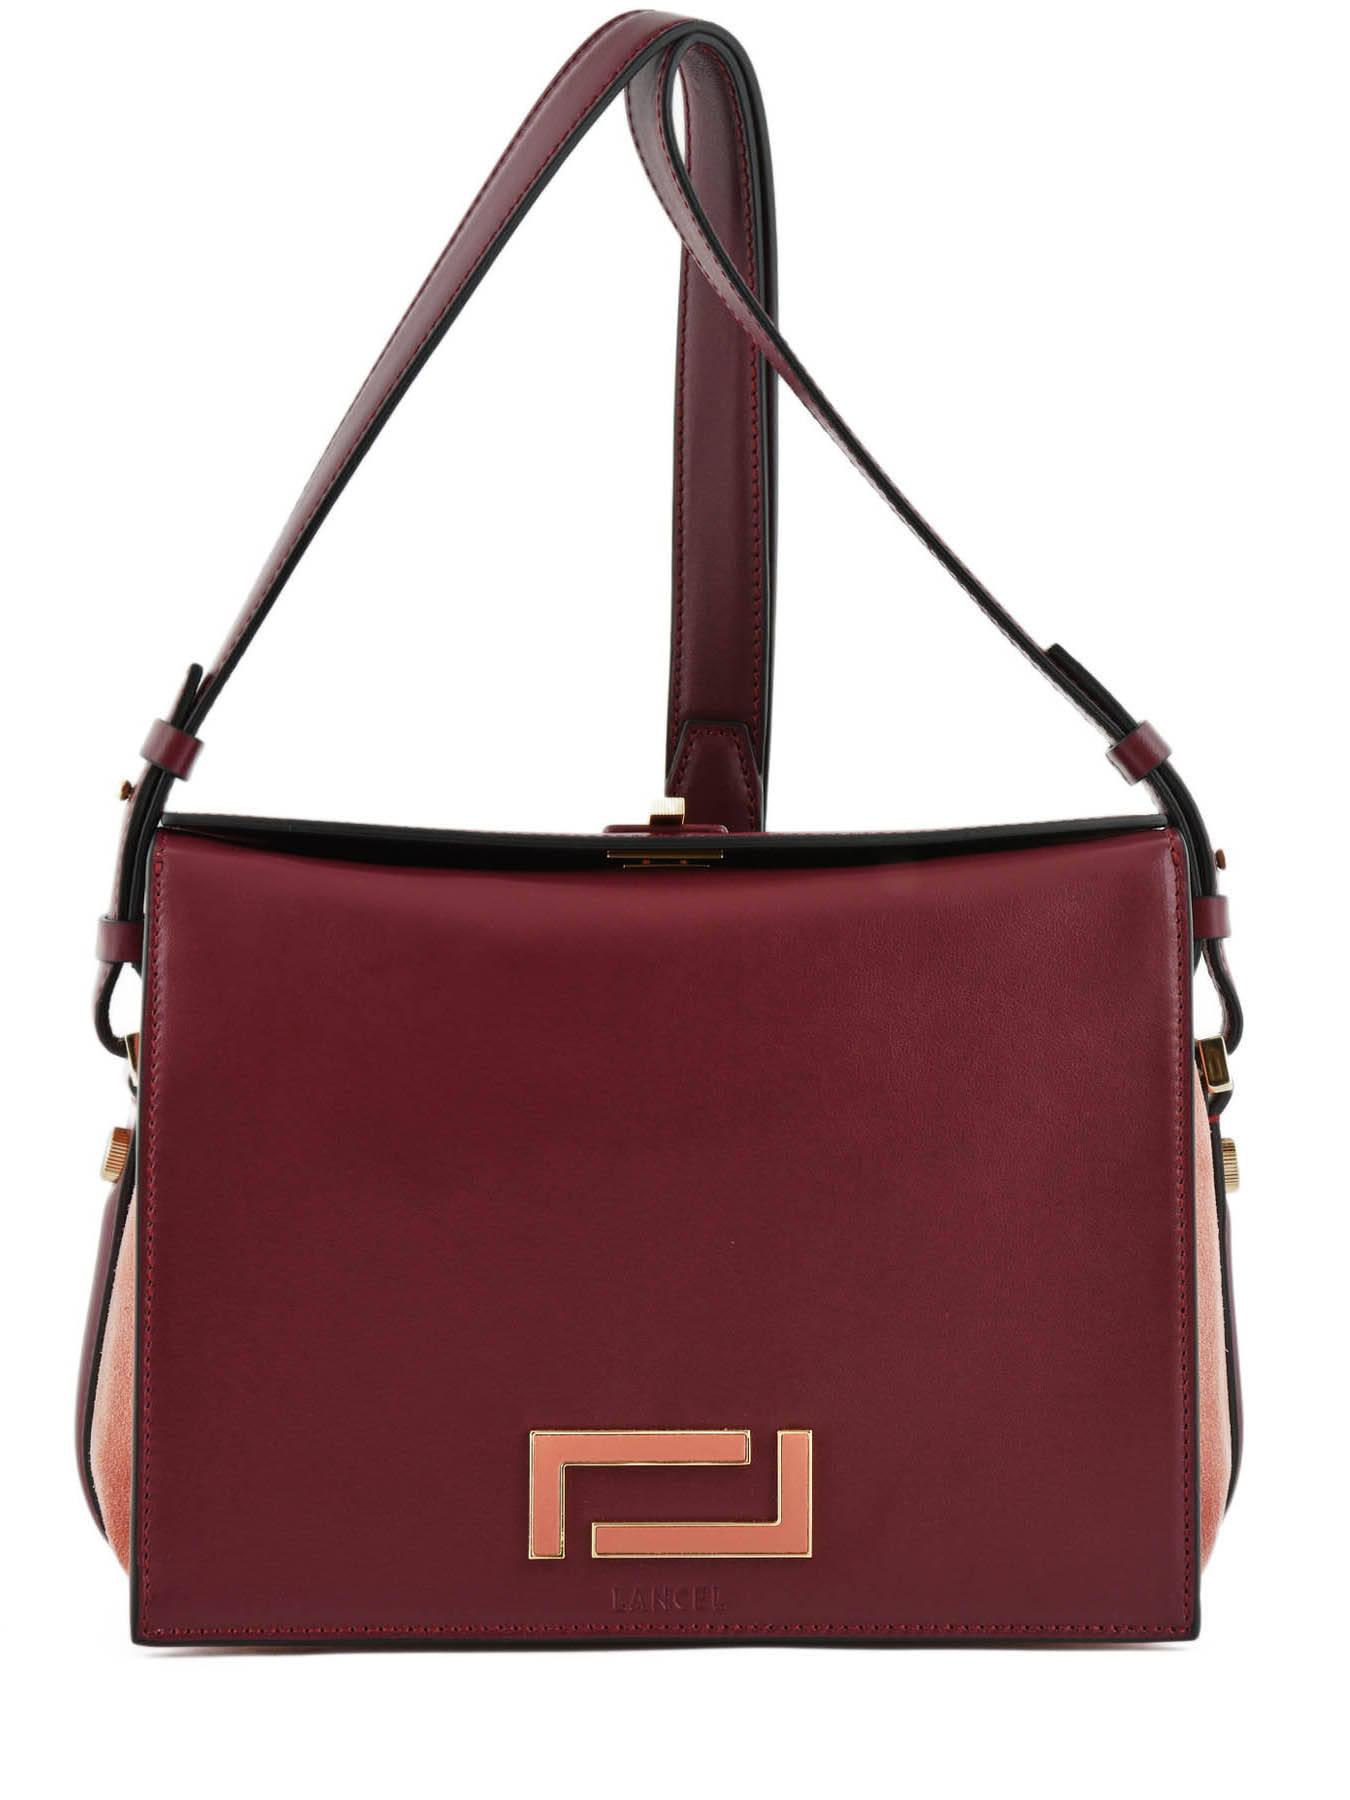 Crossbody Bag L Pia Leather Lancel Violet A09607